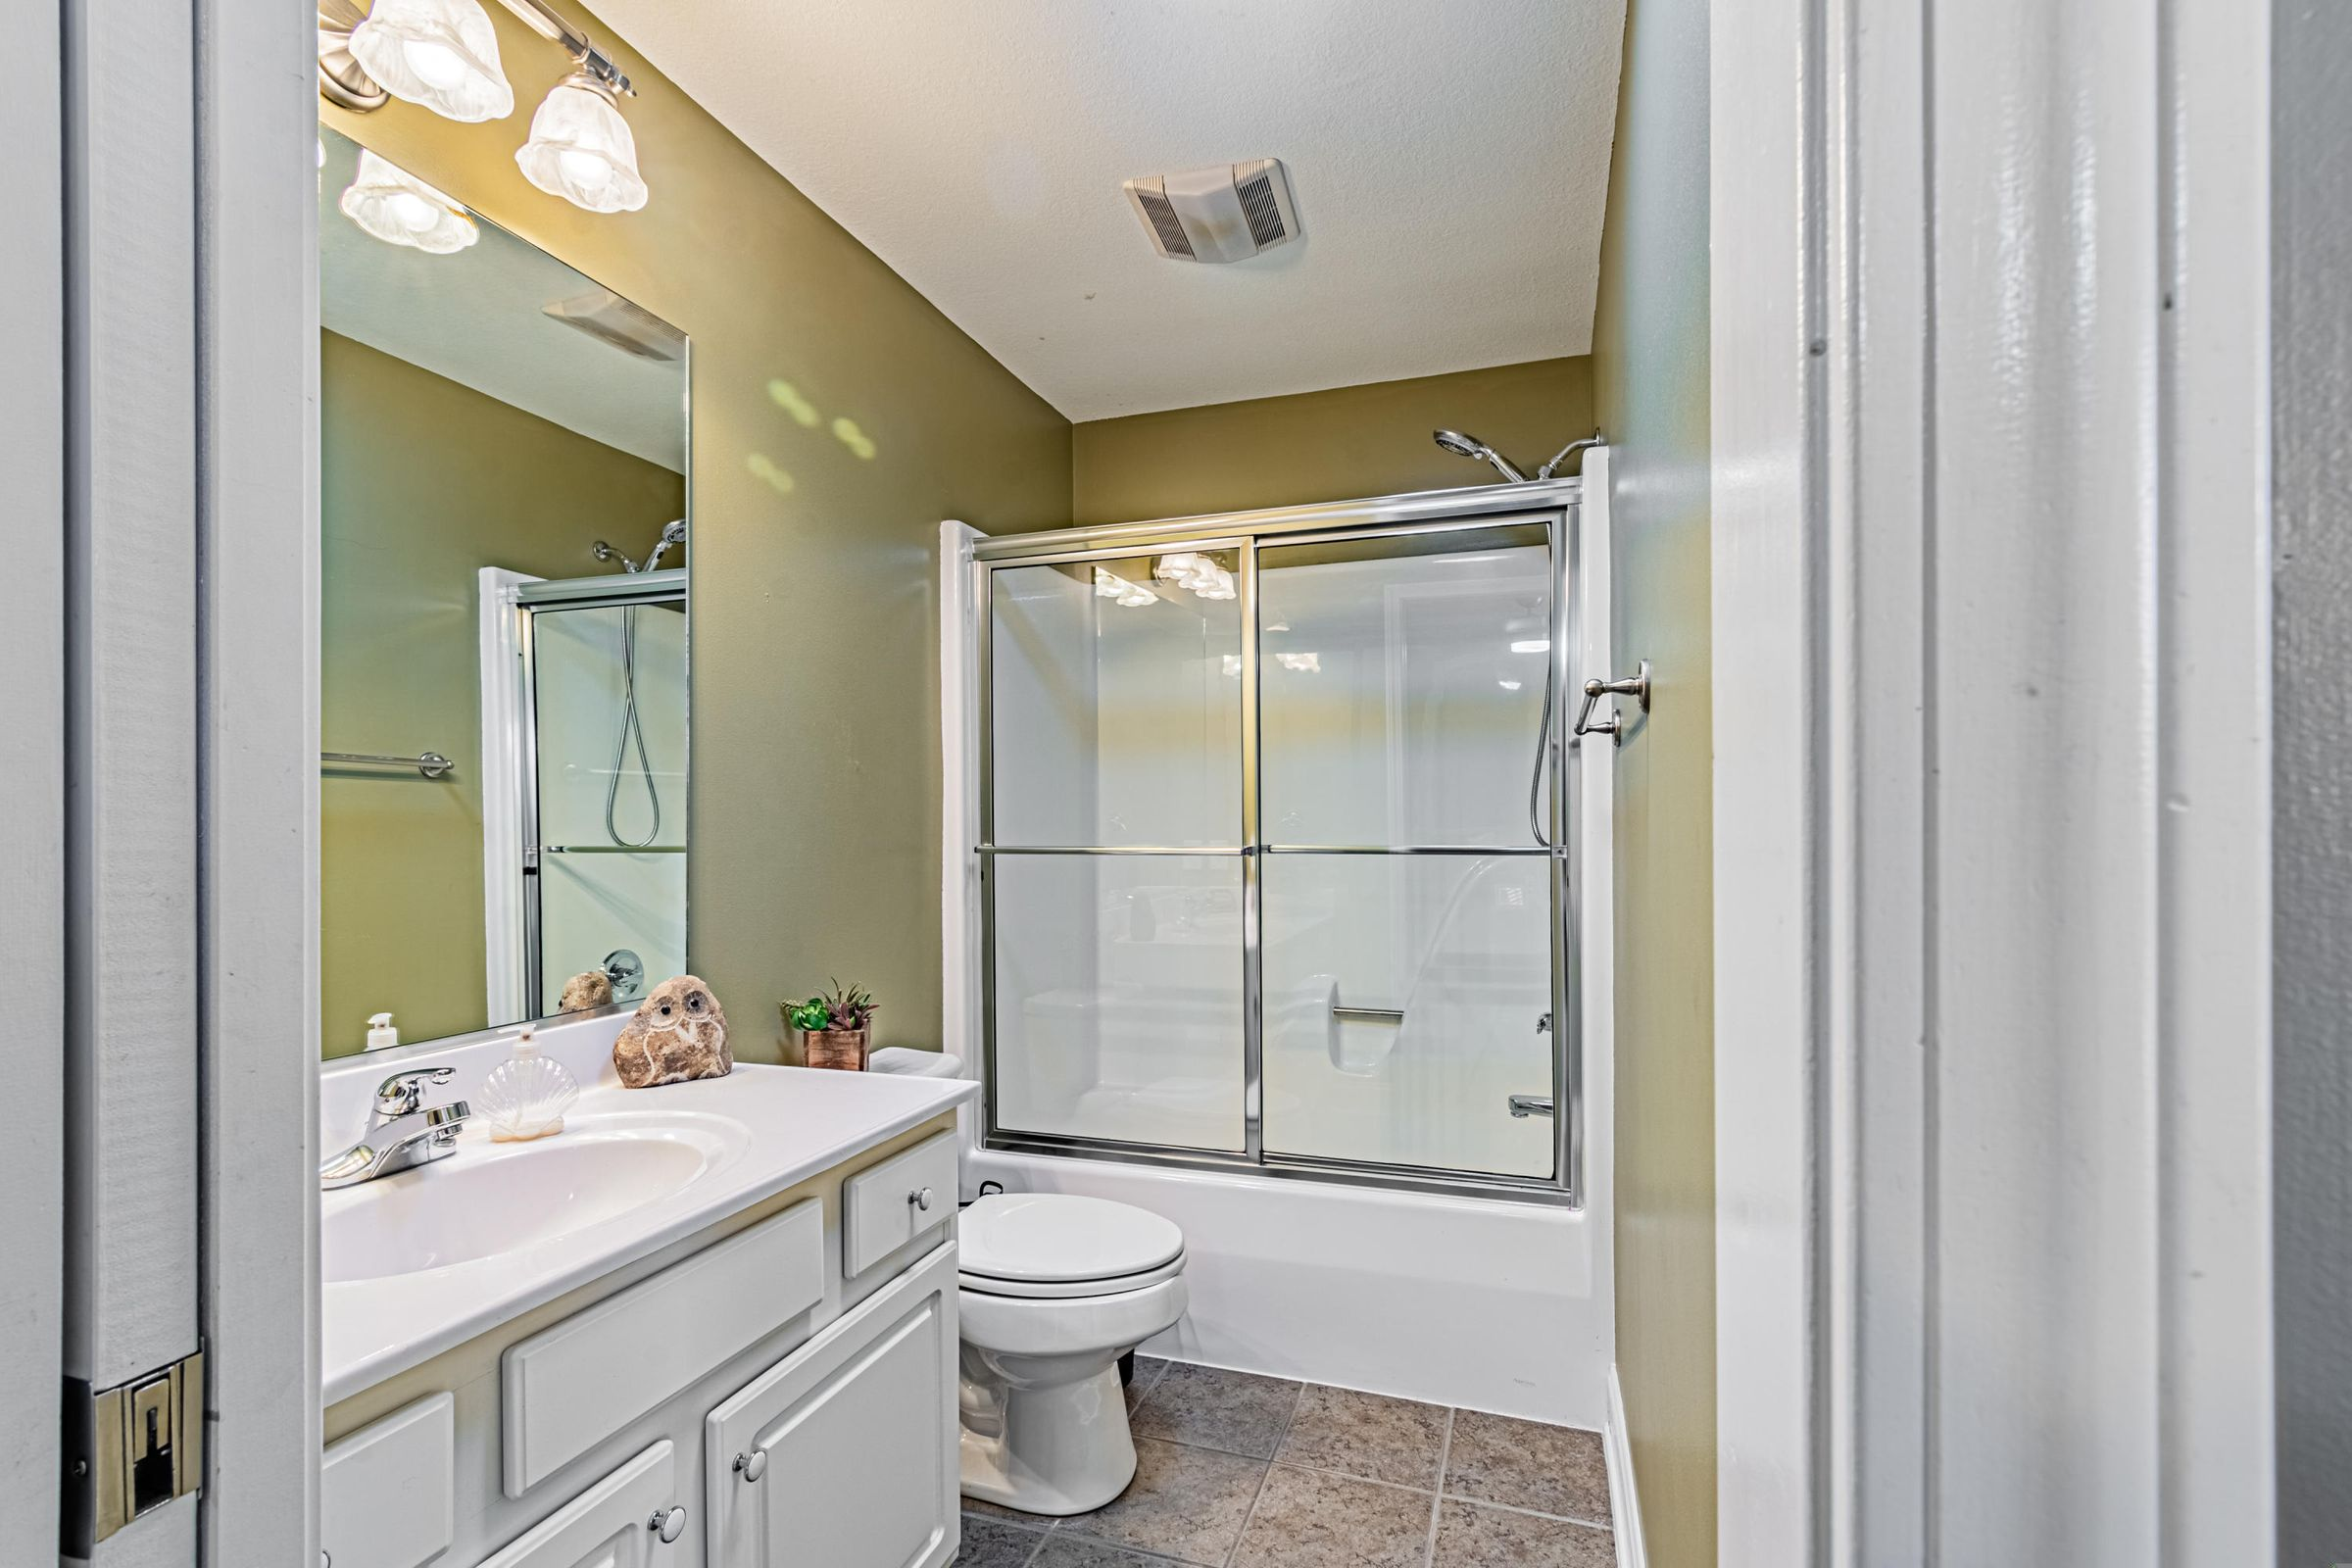 Cionnecting bathroom